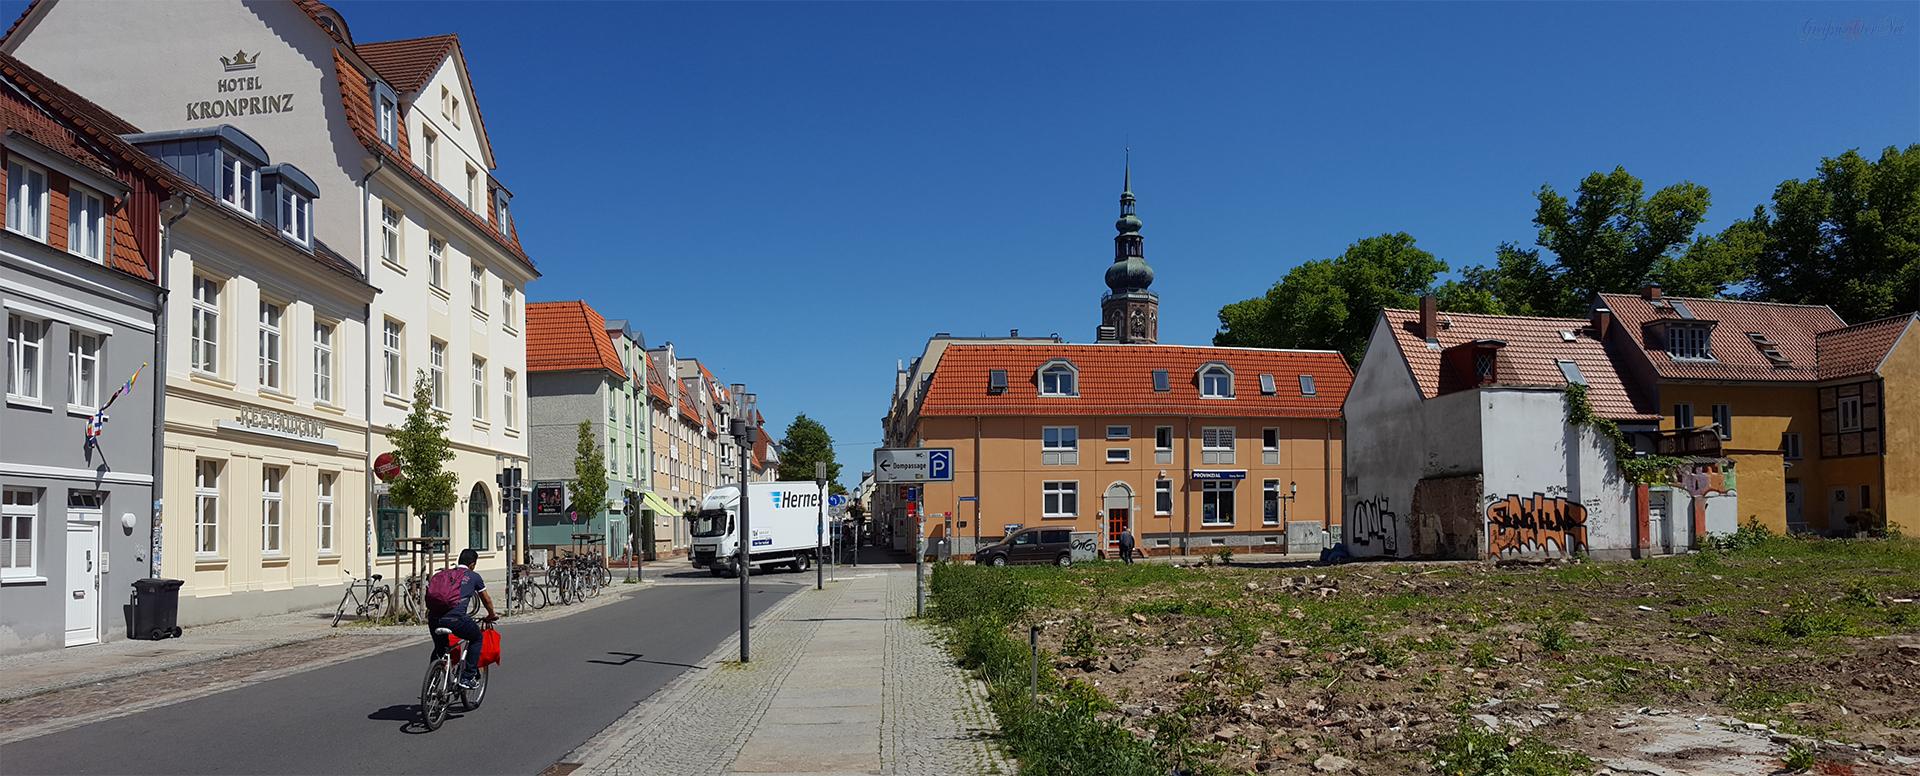 Greifswald - Lange Straße